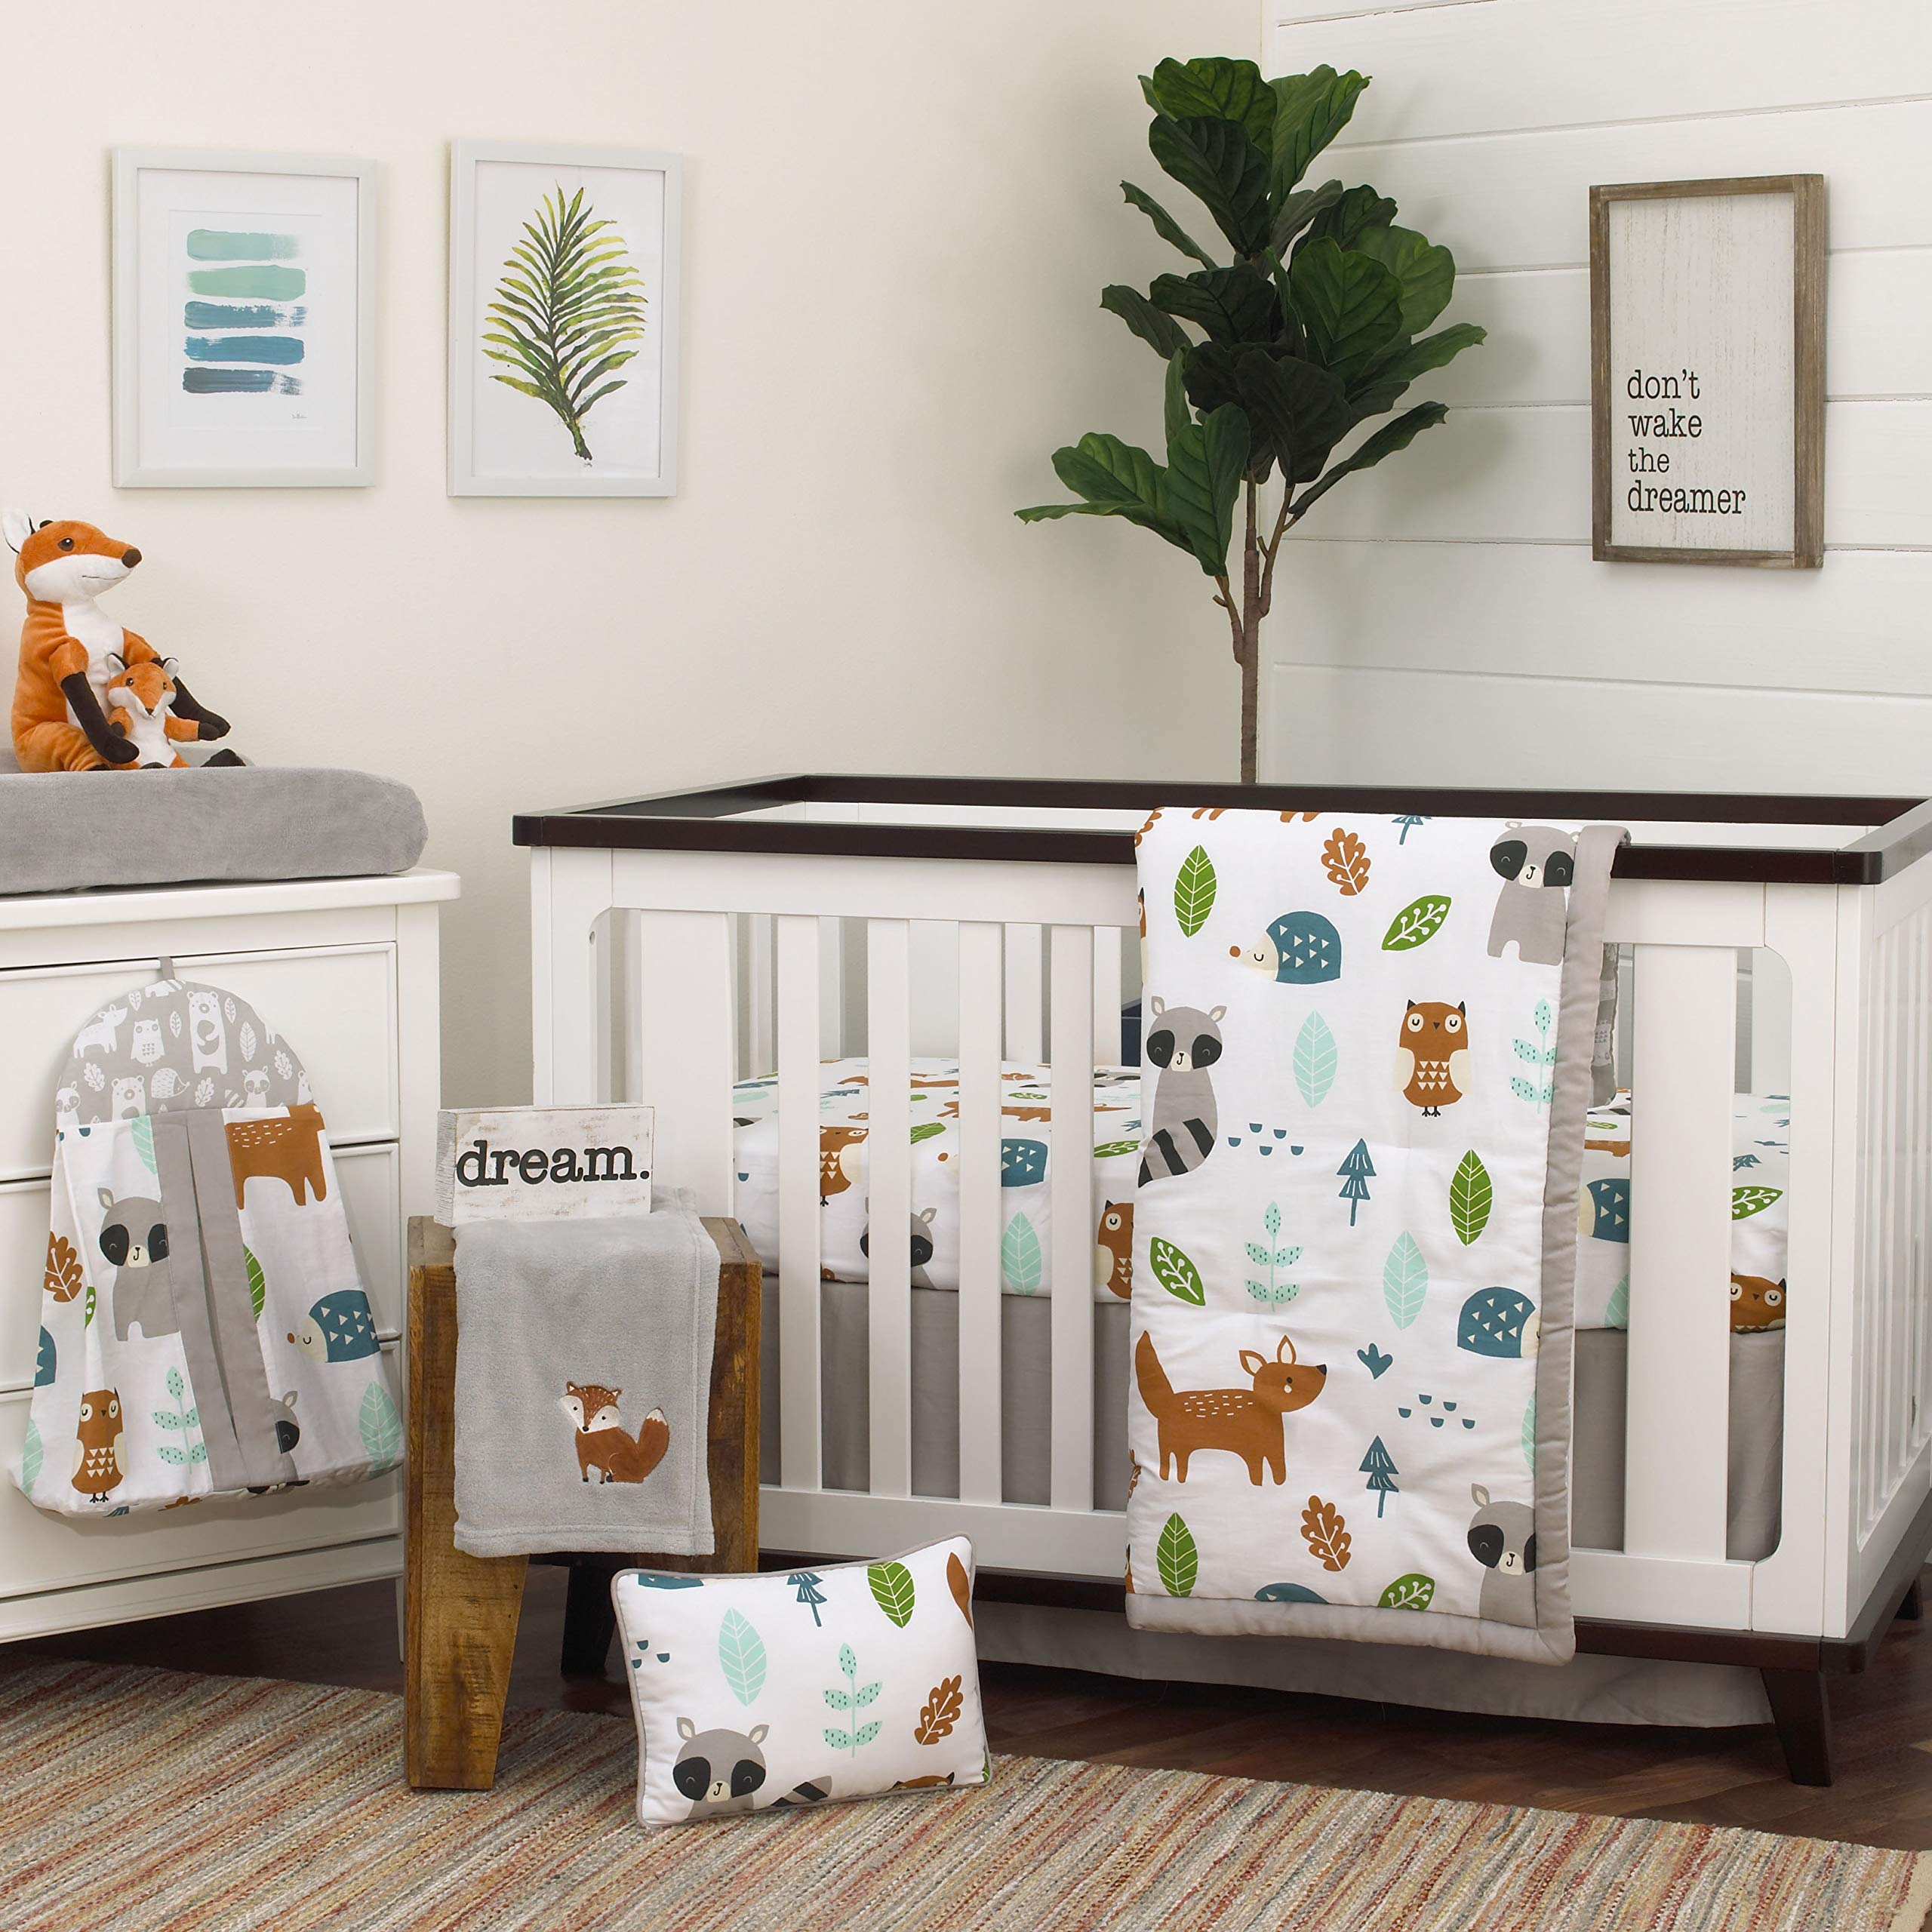 NoJo Dreamer Little Dinosaurs 8 Piece Nursery Crib Bedding Set Navy Blue//Grey//White